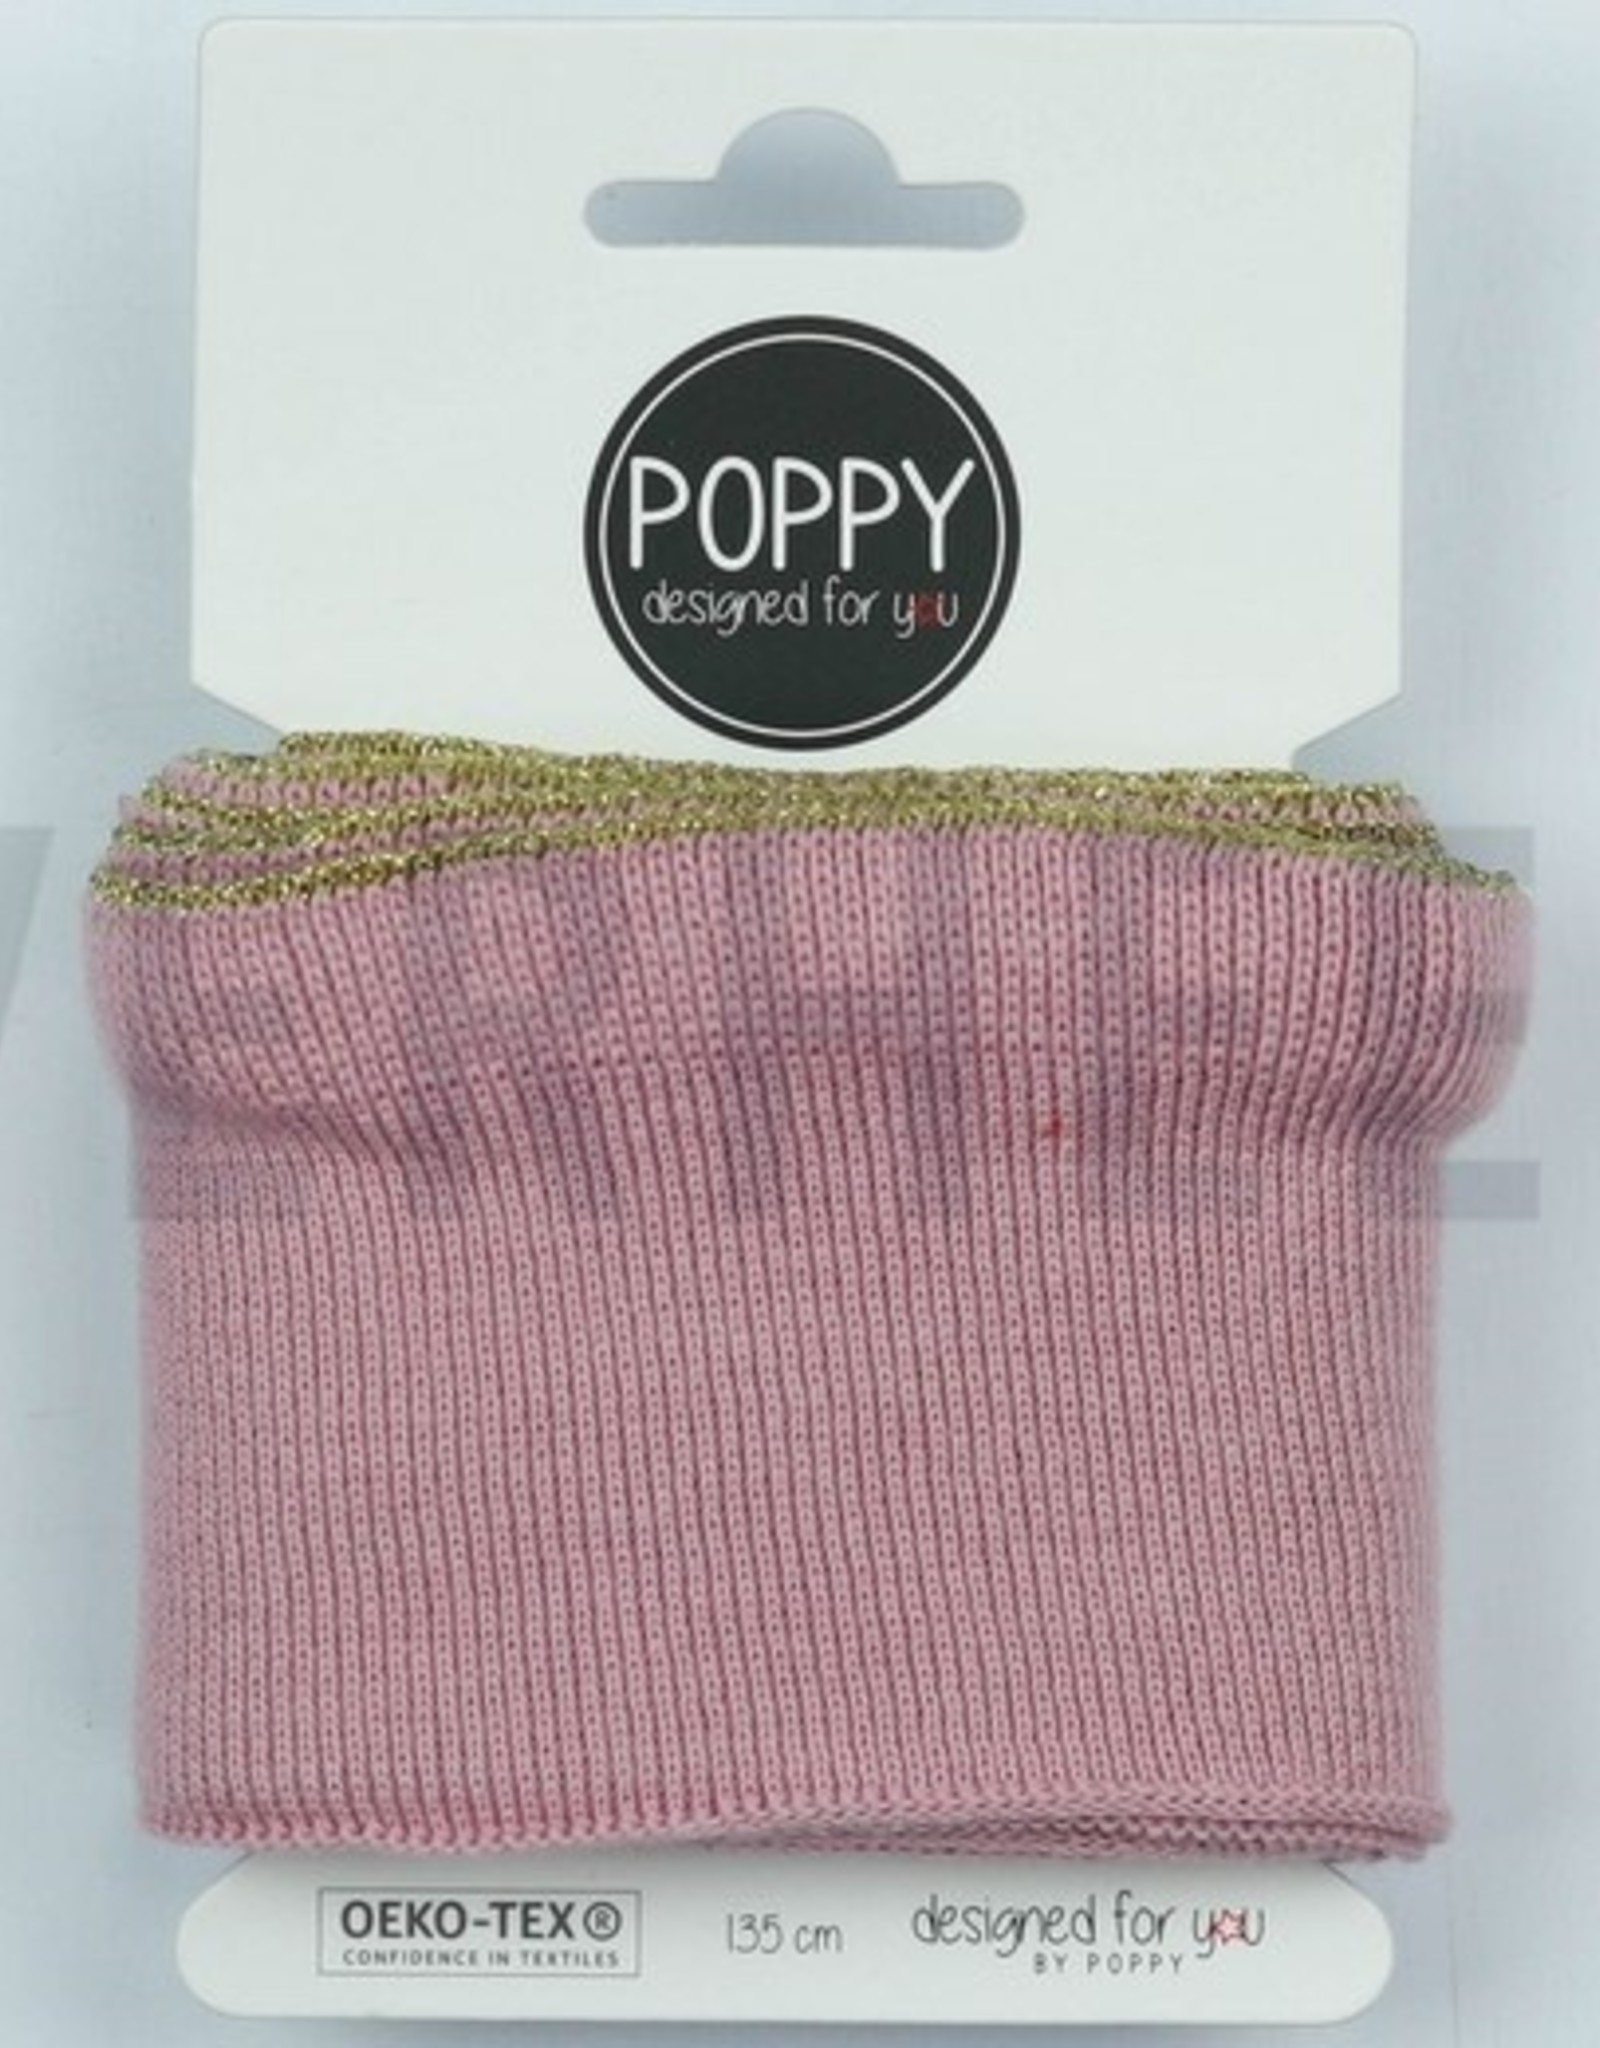 Poppy designed for you Cuff oudrose met ruffle met gouden bies - Poppy